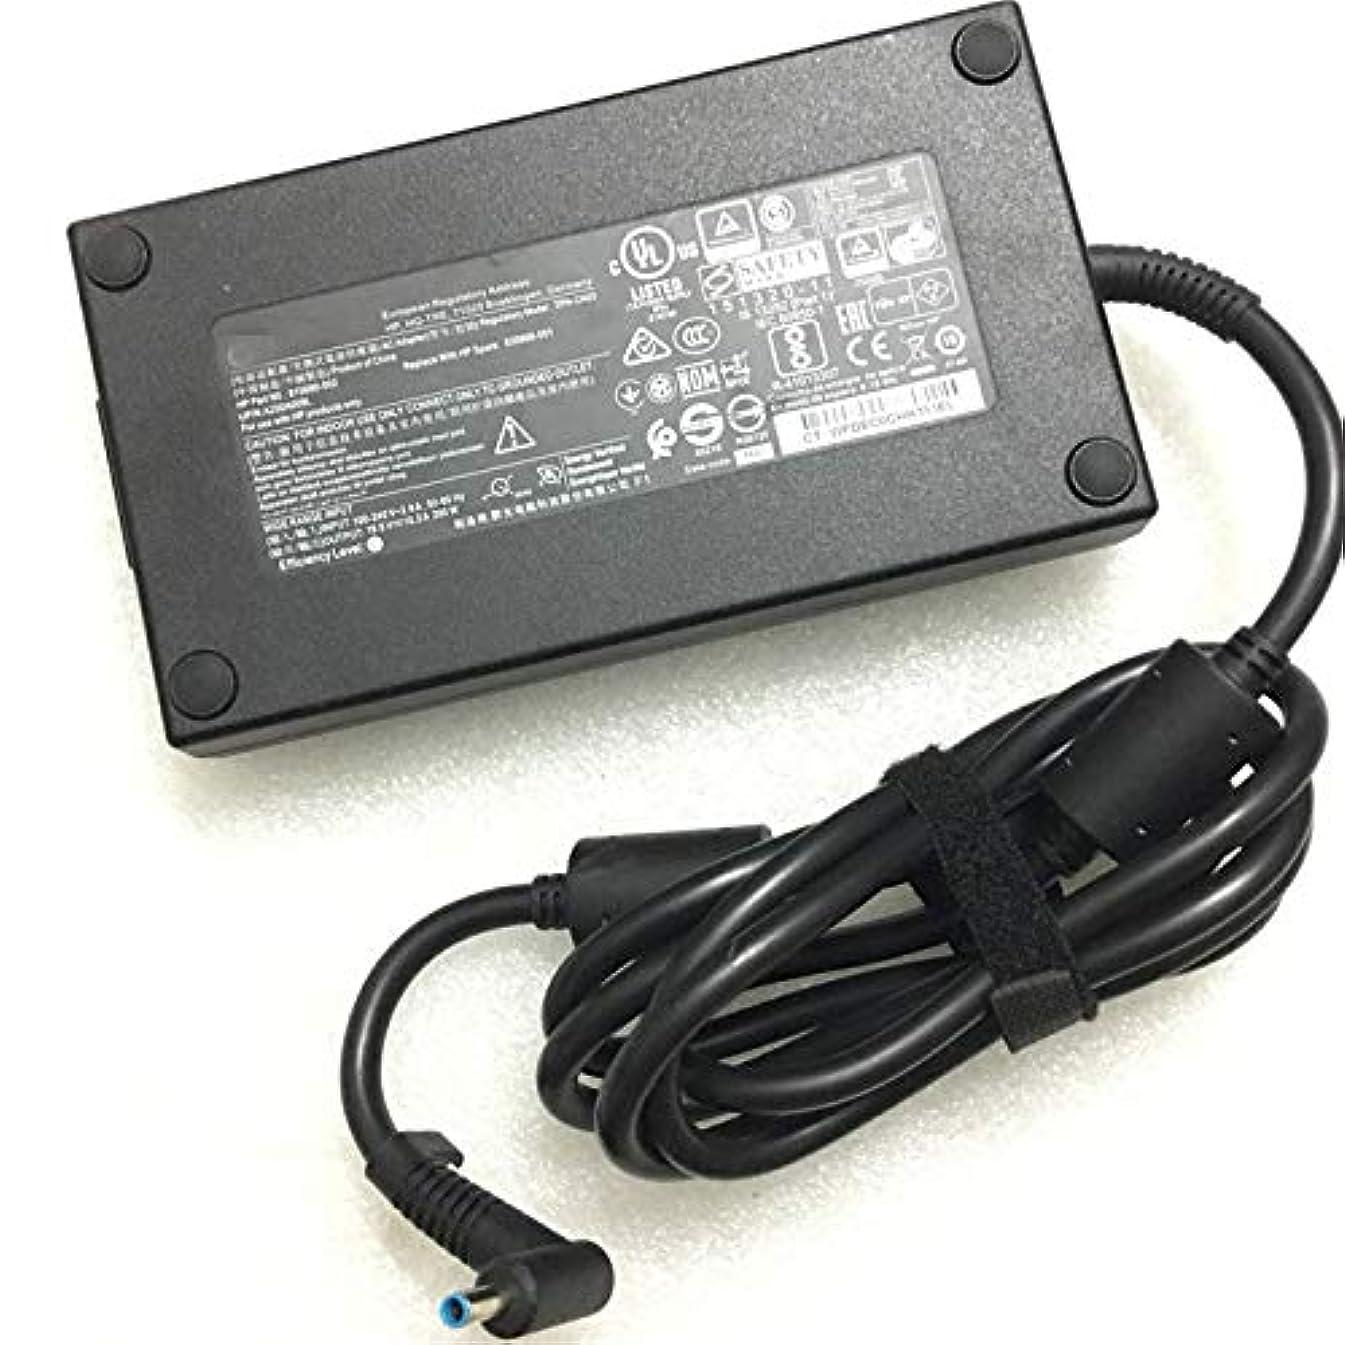 OEM for HP 19.5V 10.3A 200W Slim AC Adapter for ZBook 17 G3/V1Q08UT#ABA